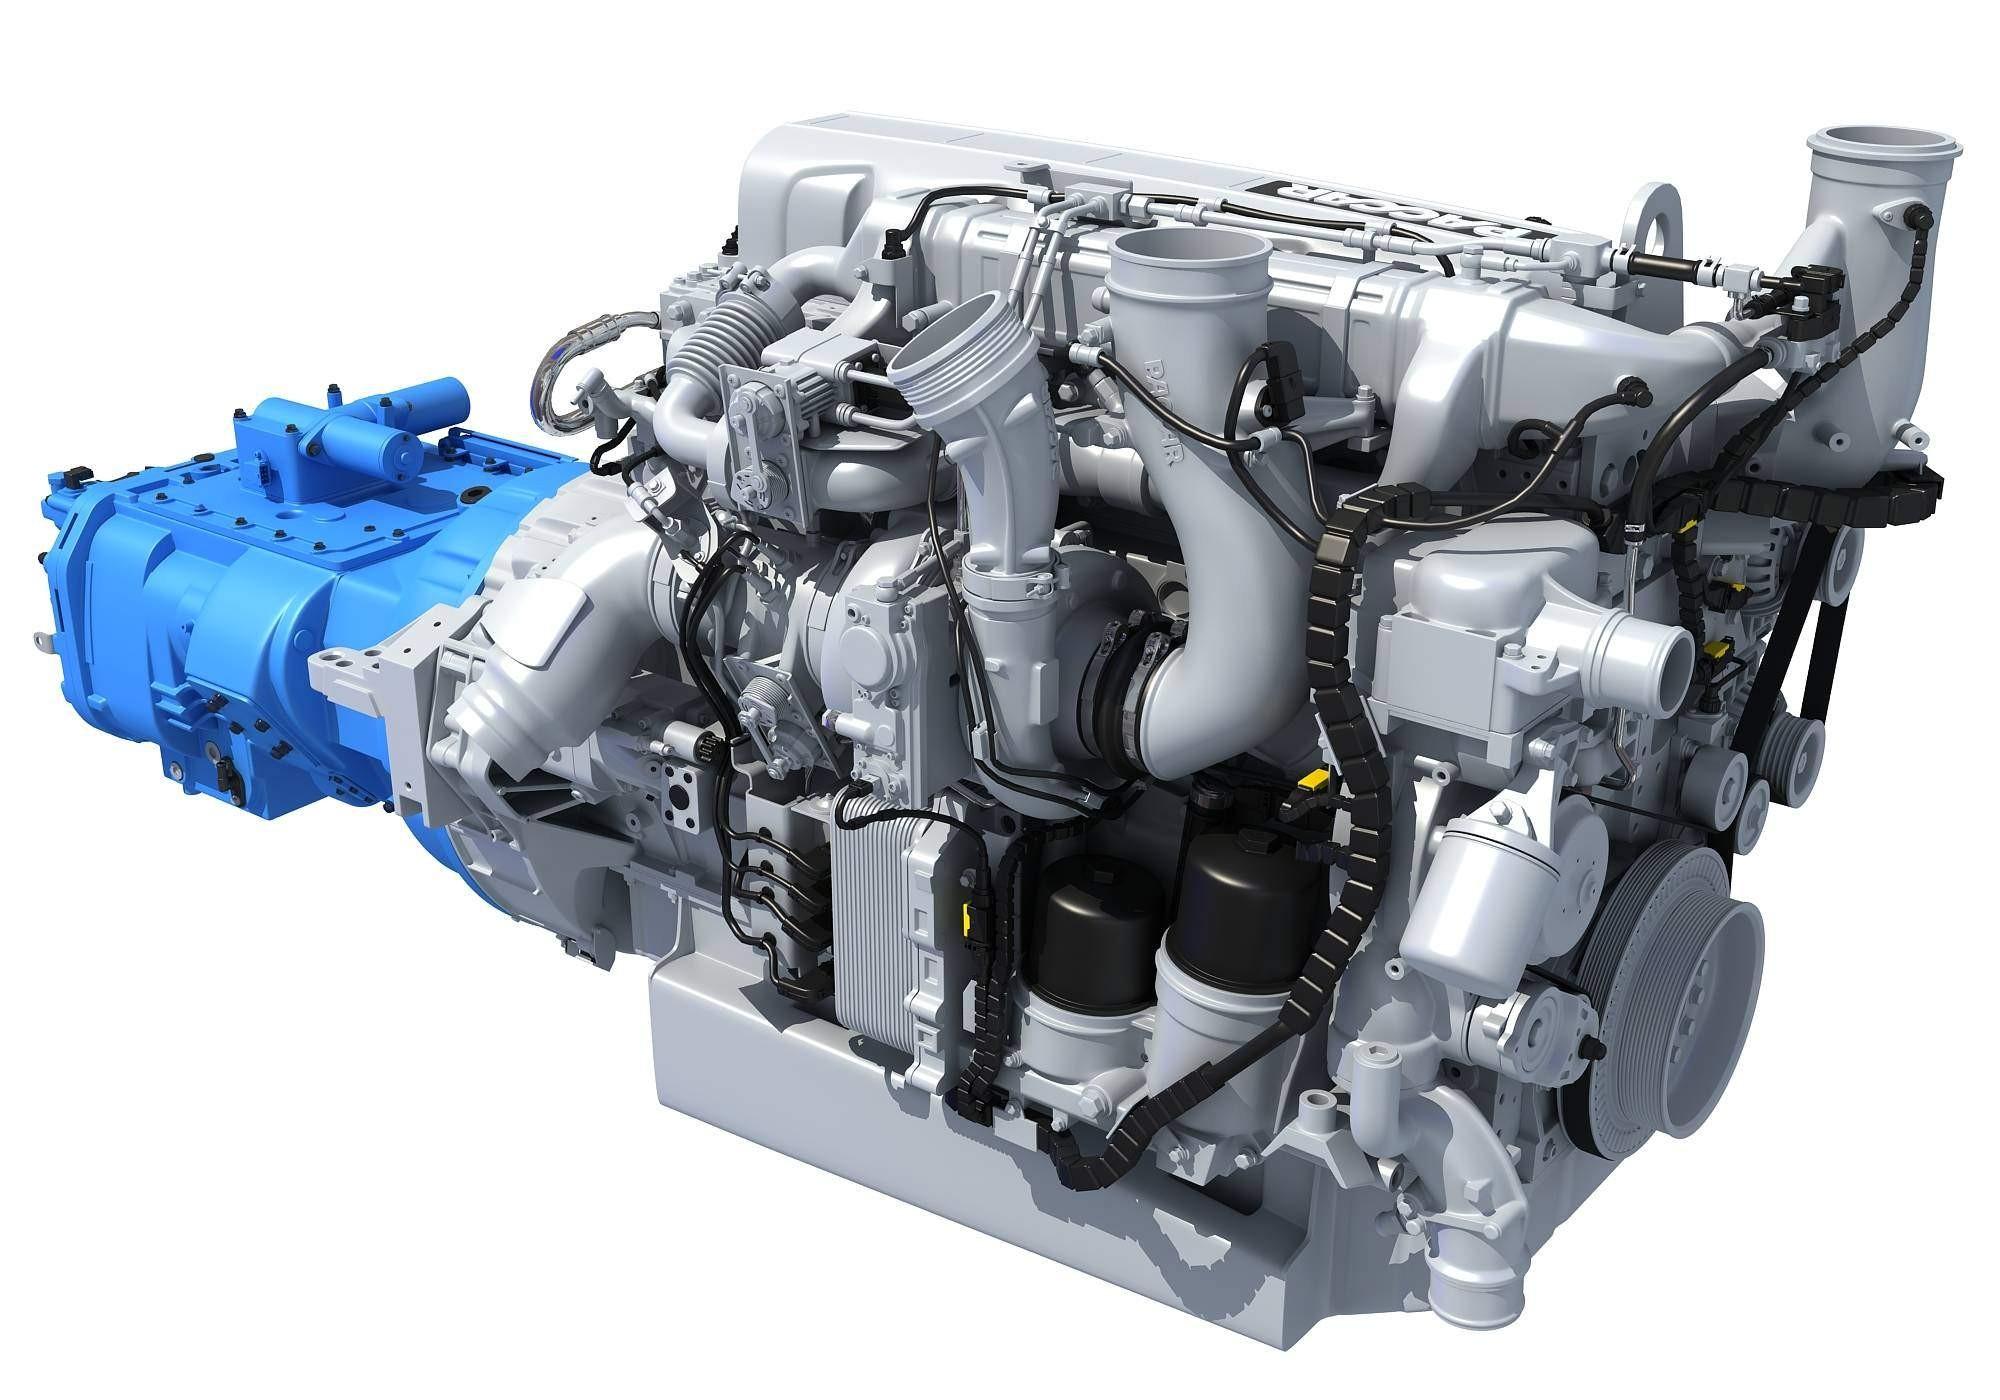 Paccar Mx13 Ecu Wiring Paccar M X 13 Engine Reviews Of Paccar Mx13 Ecu Wiring